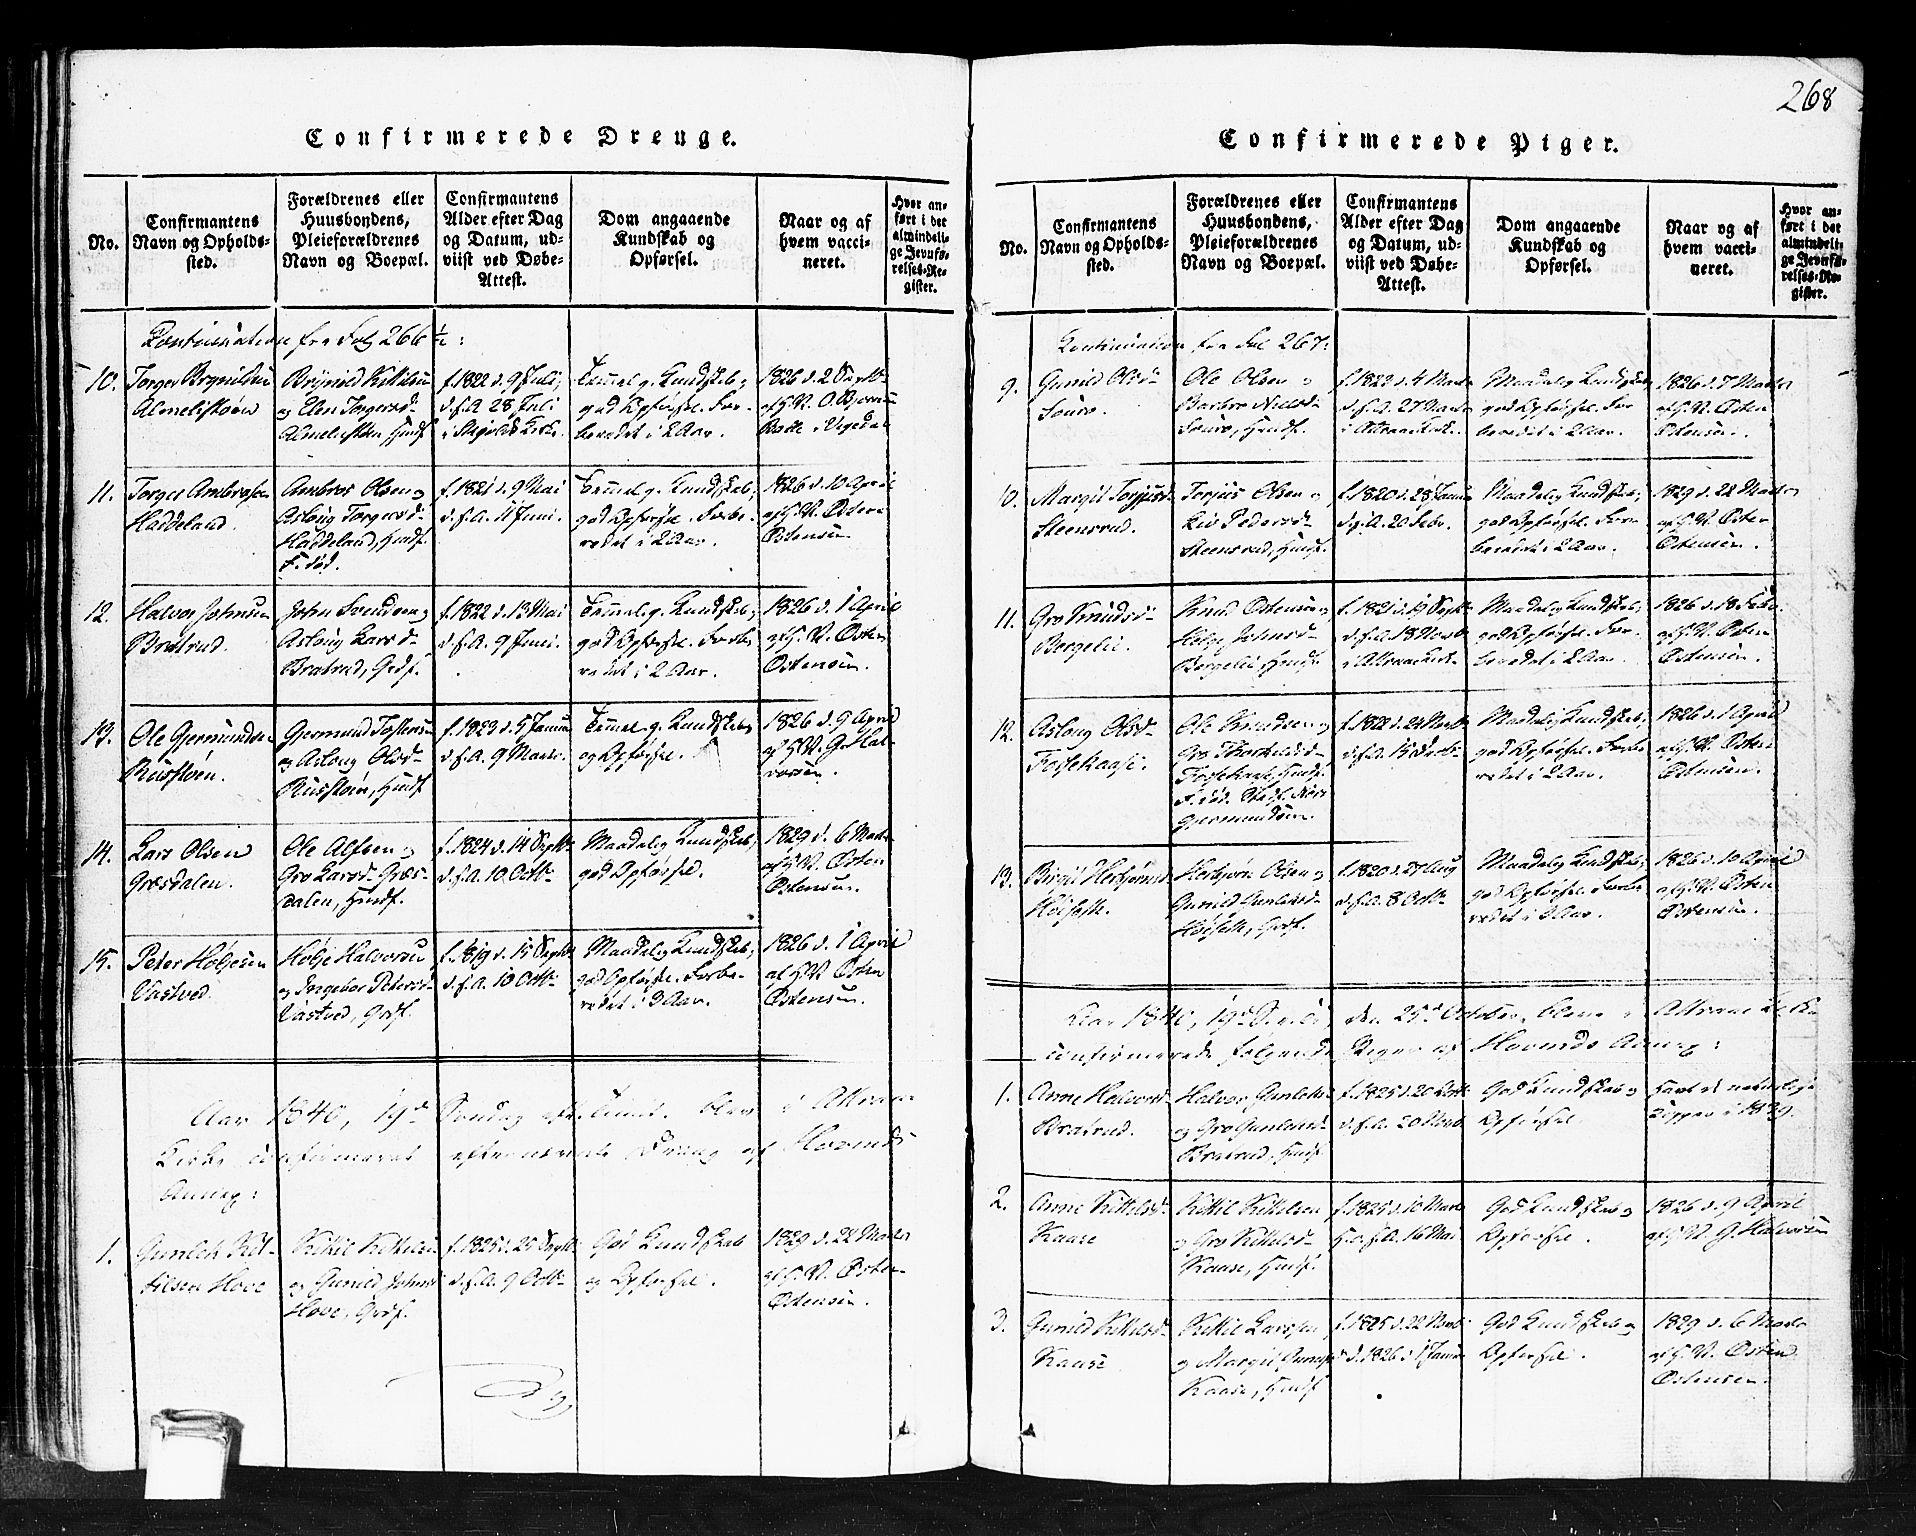 SAKO, Gransherad kirkebøker, F/Fb/L0002: Ministerialbok nr. II 2, 1815-1843, s. 268